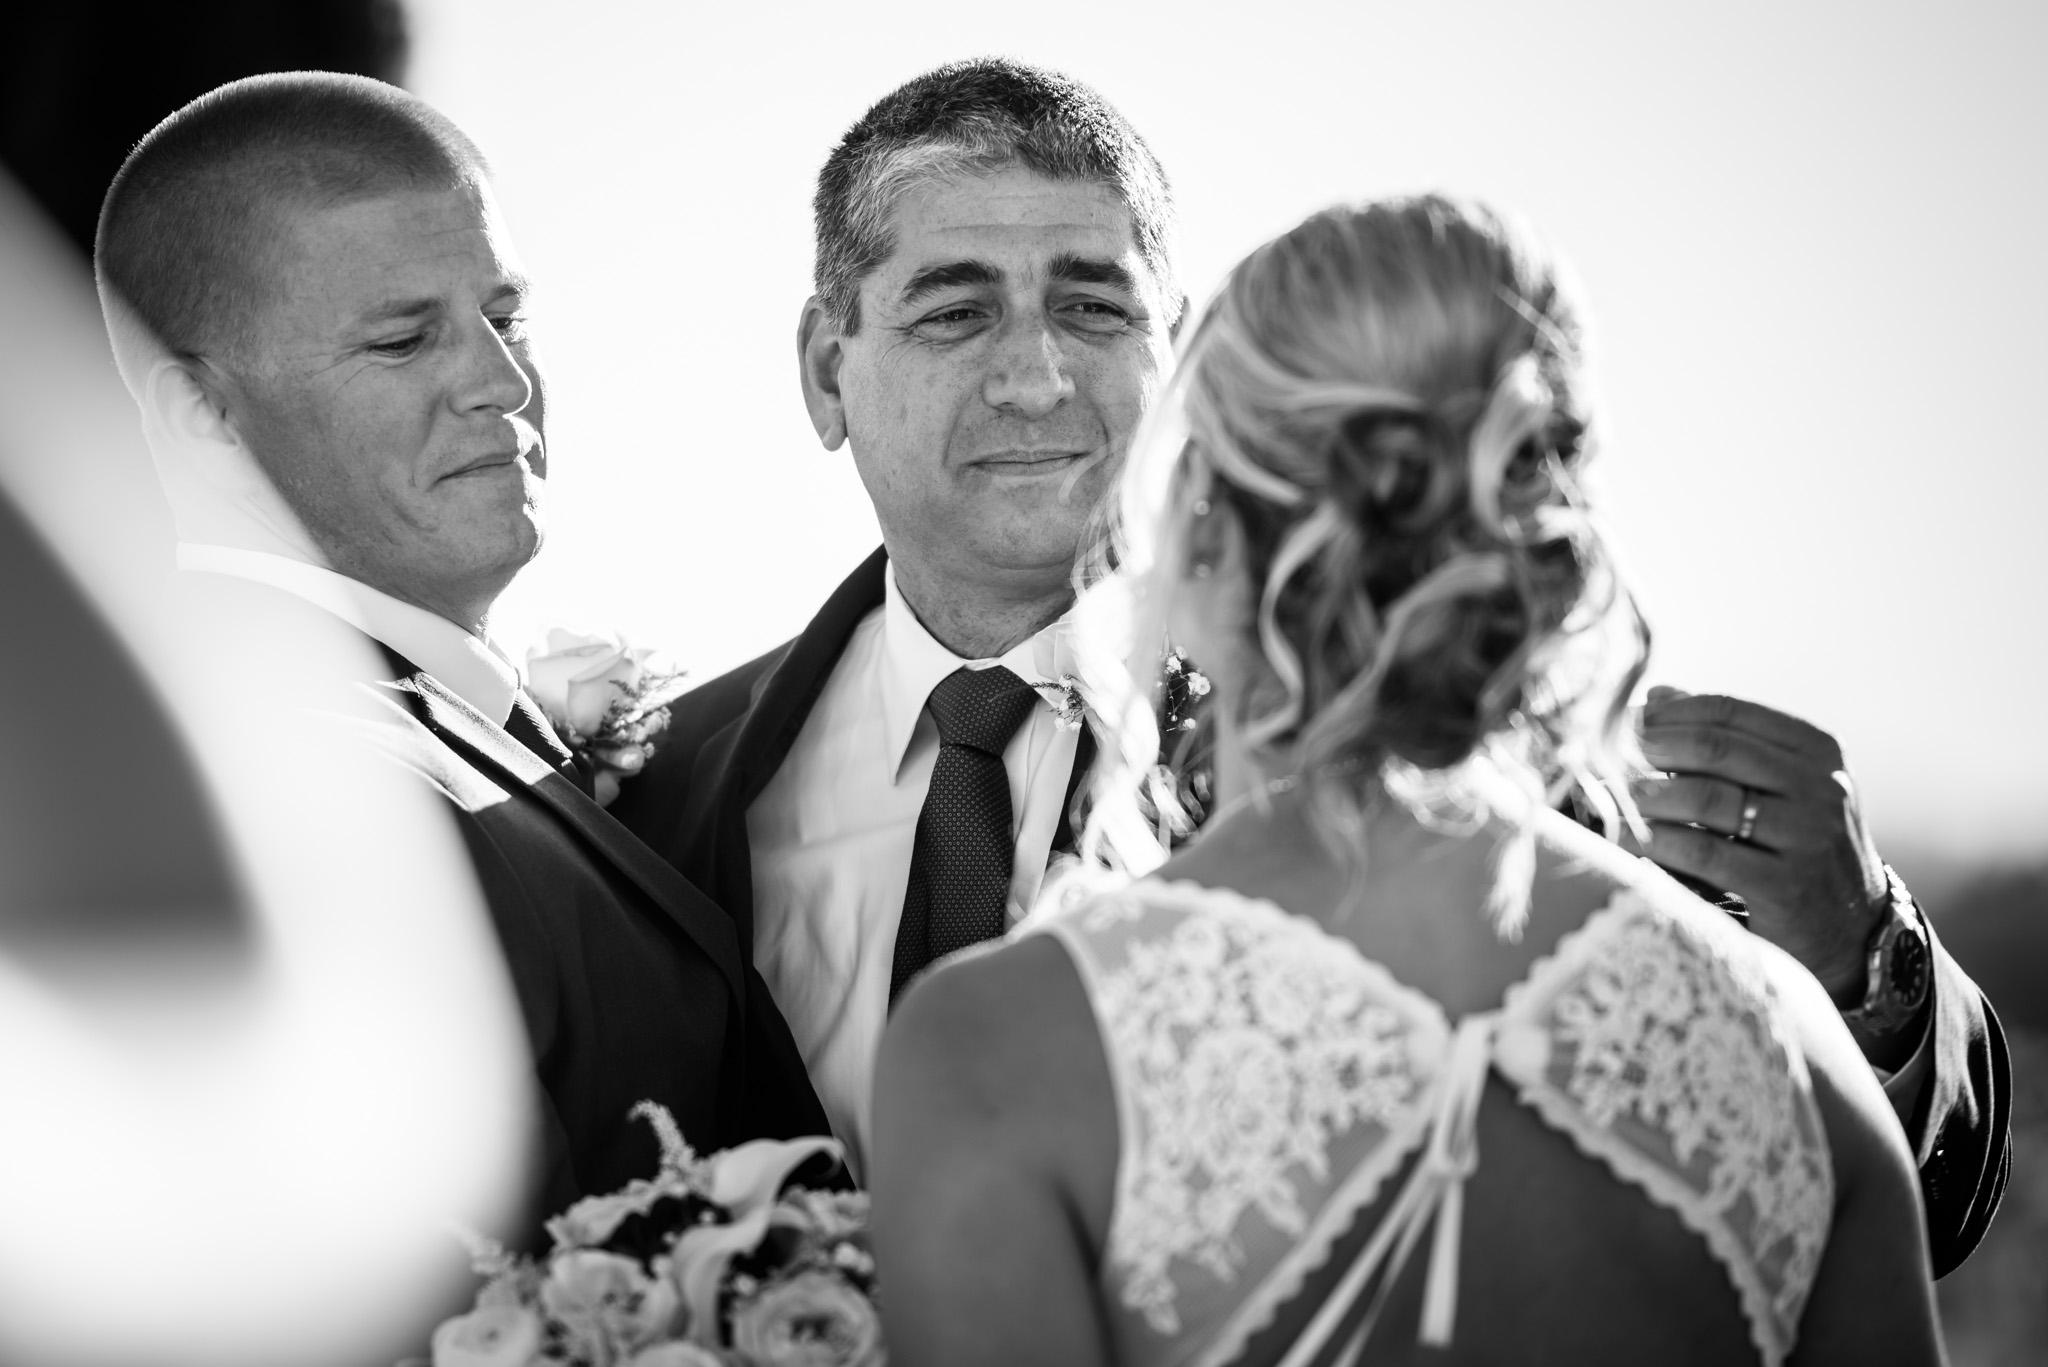 Avensole-Winery-Temecula-Wedding-Josh-and-Olivia-3504.JPG